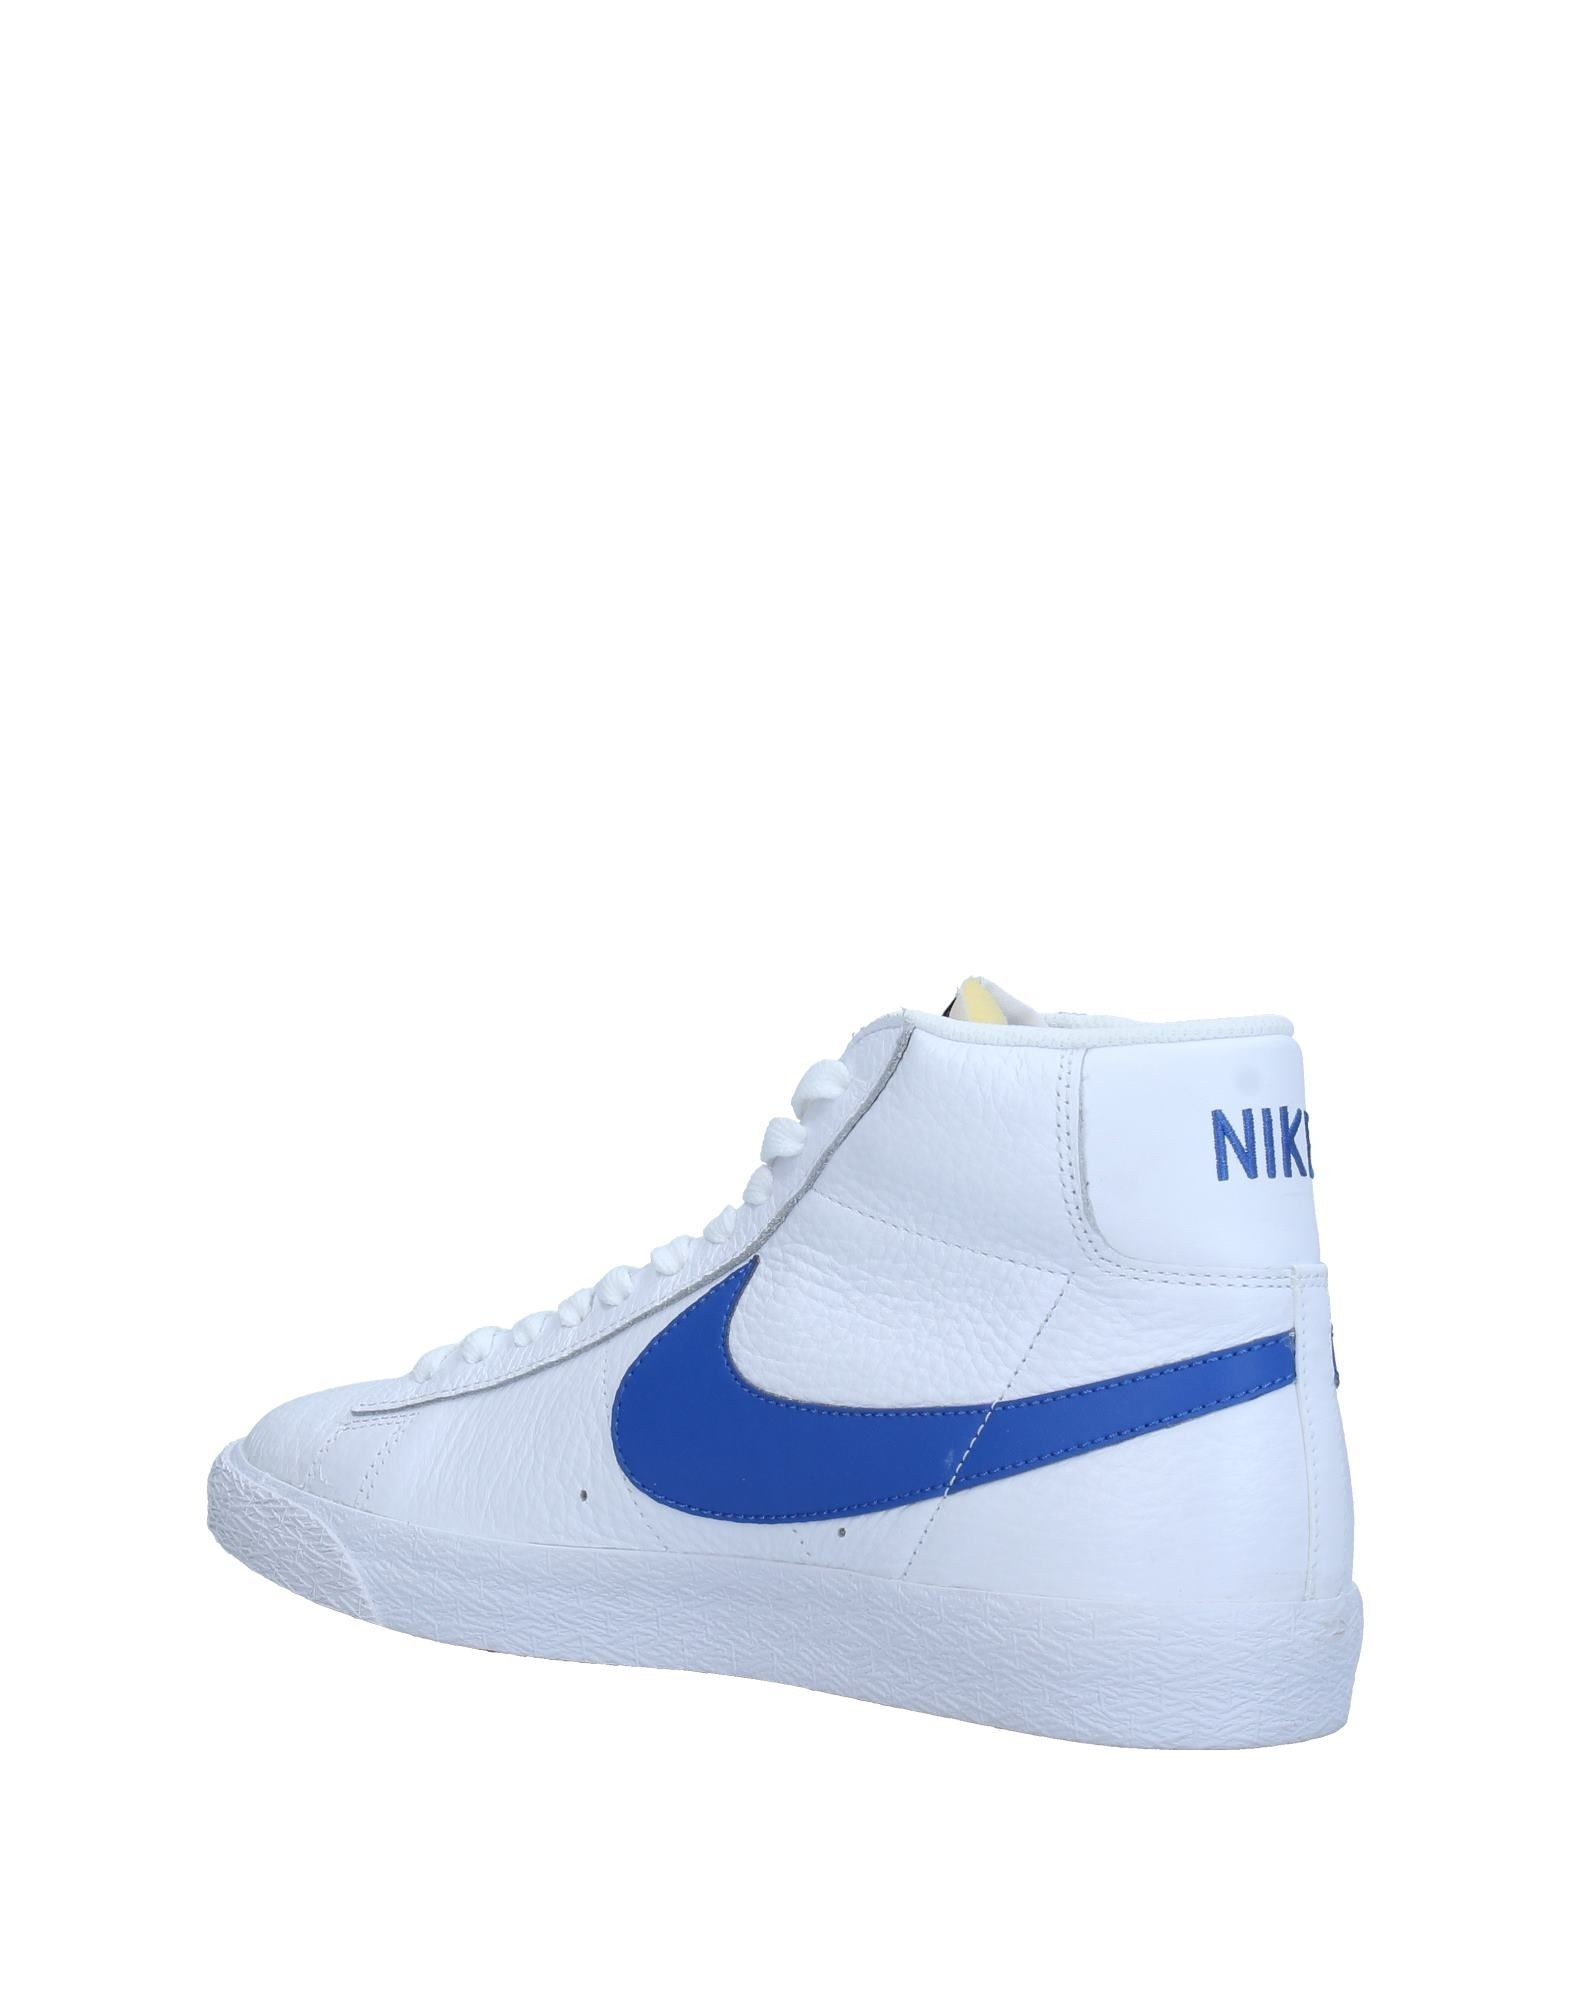 Moda Sneakers Nike Uomo - 11328209GT